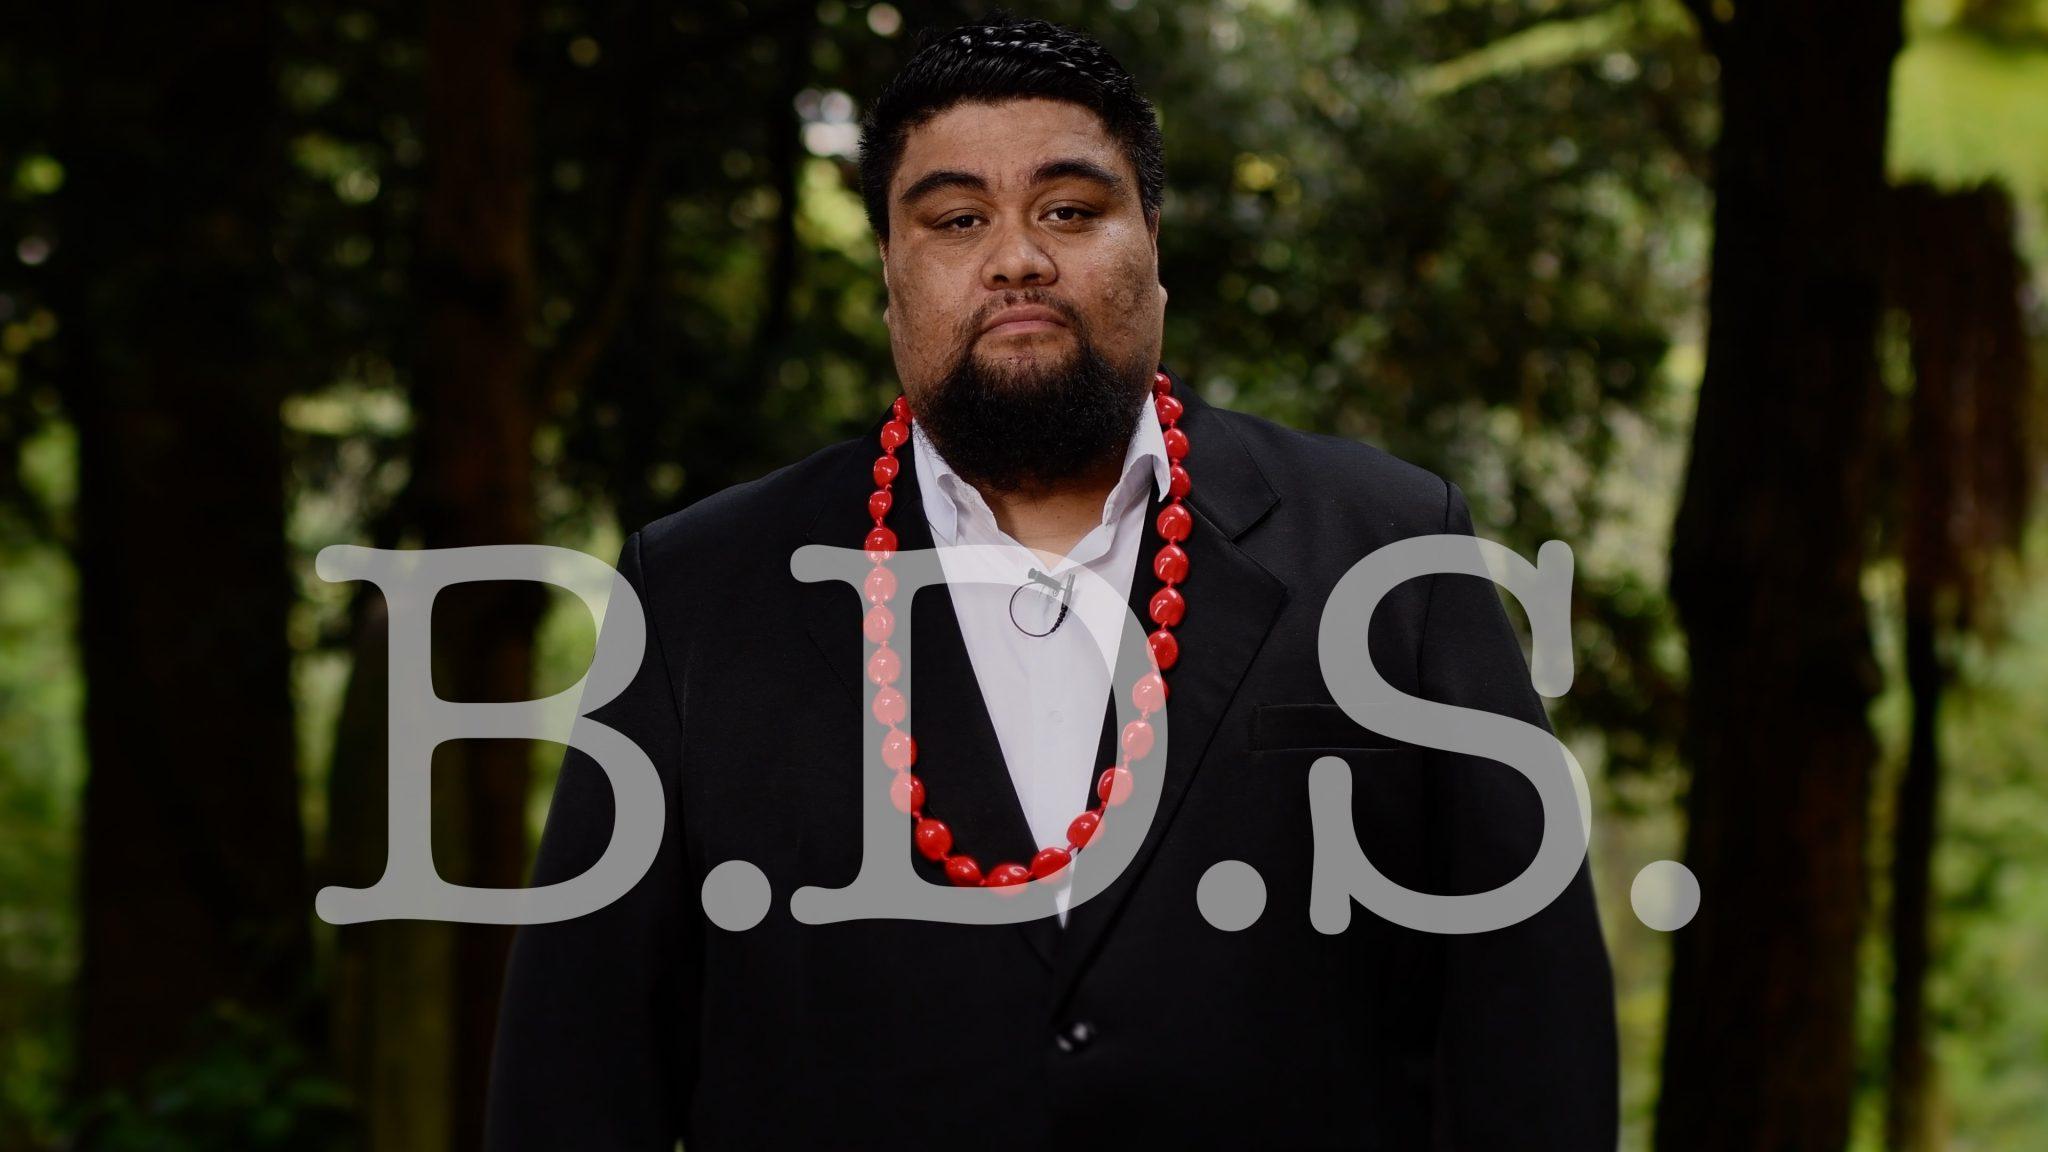 A Samoan Maori on BDS